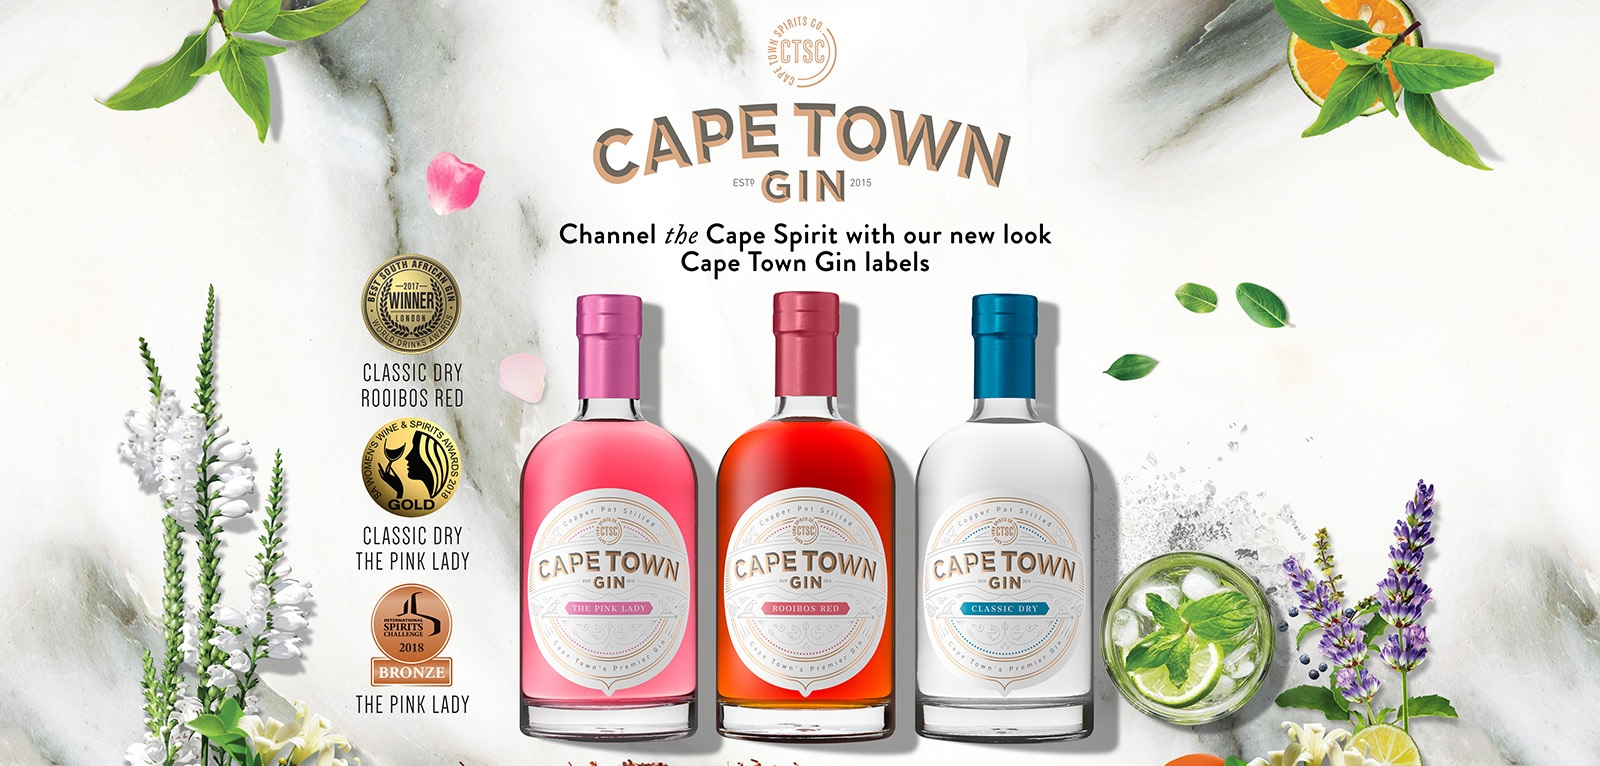 Cape Town Gin - Gin Tasting - Cape Town Gin Company